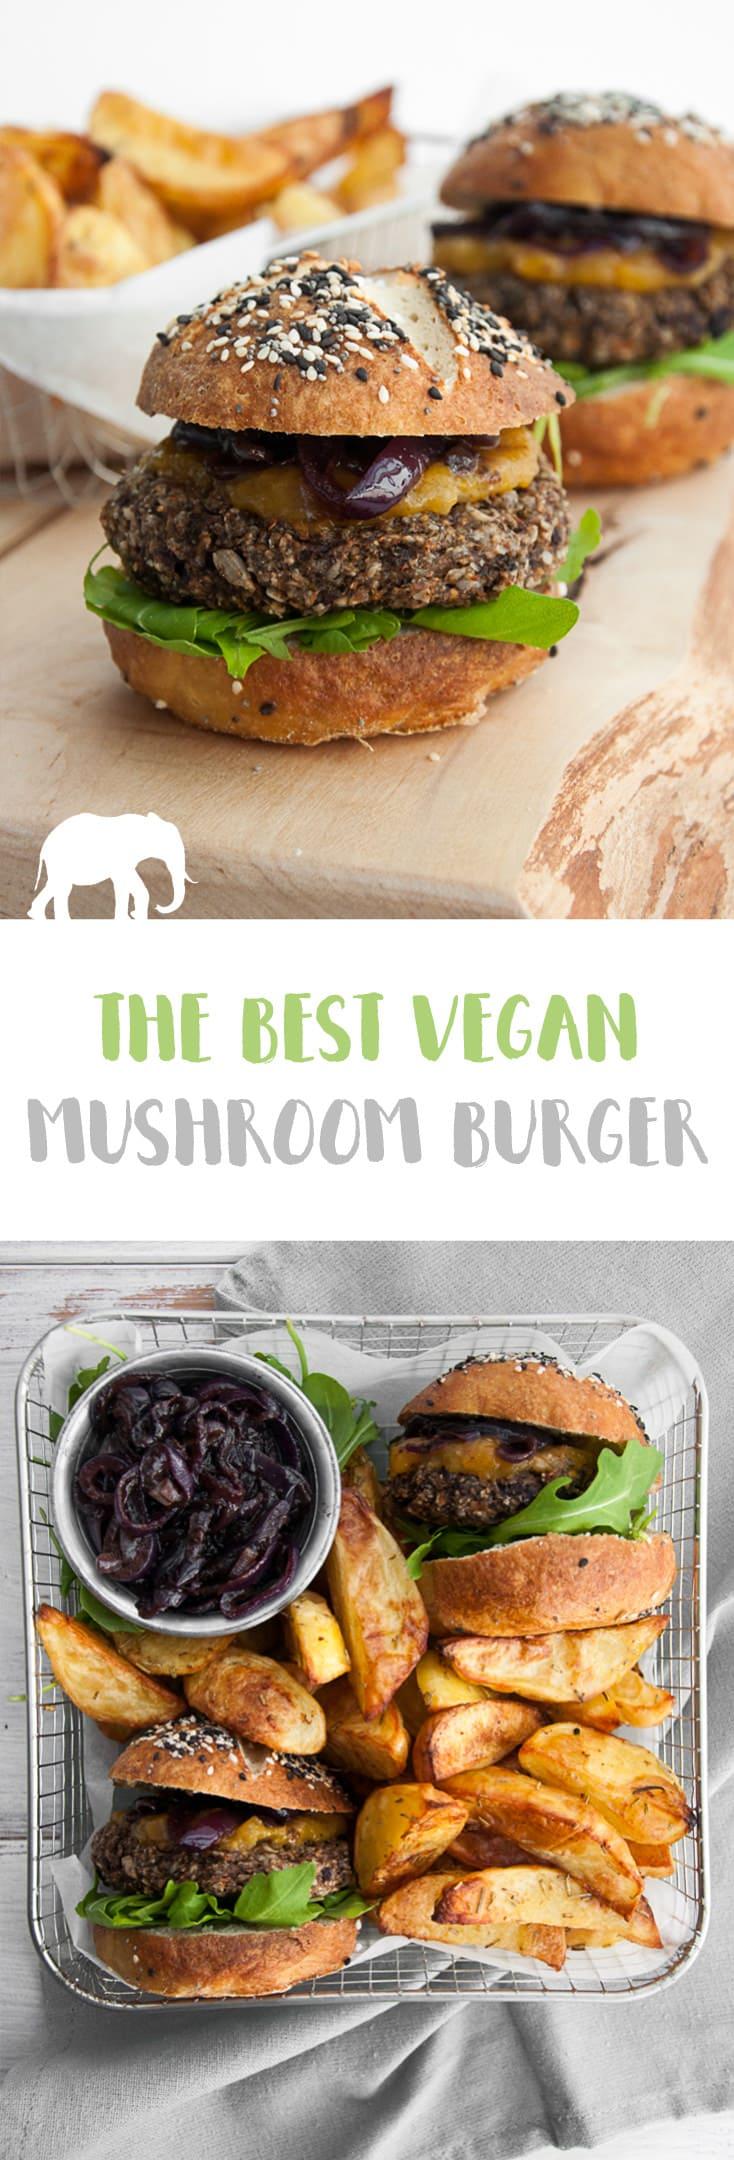 The best VEGAN MUSHROOM BURGER! #vegan #mushroom #burger   ElephantasticVegan.com